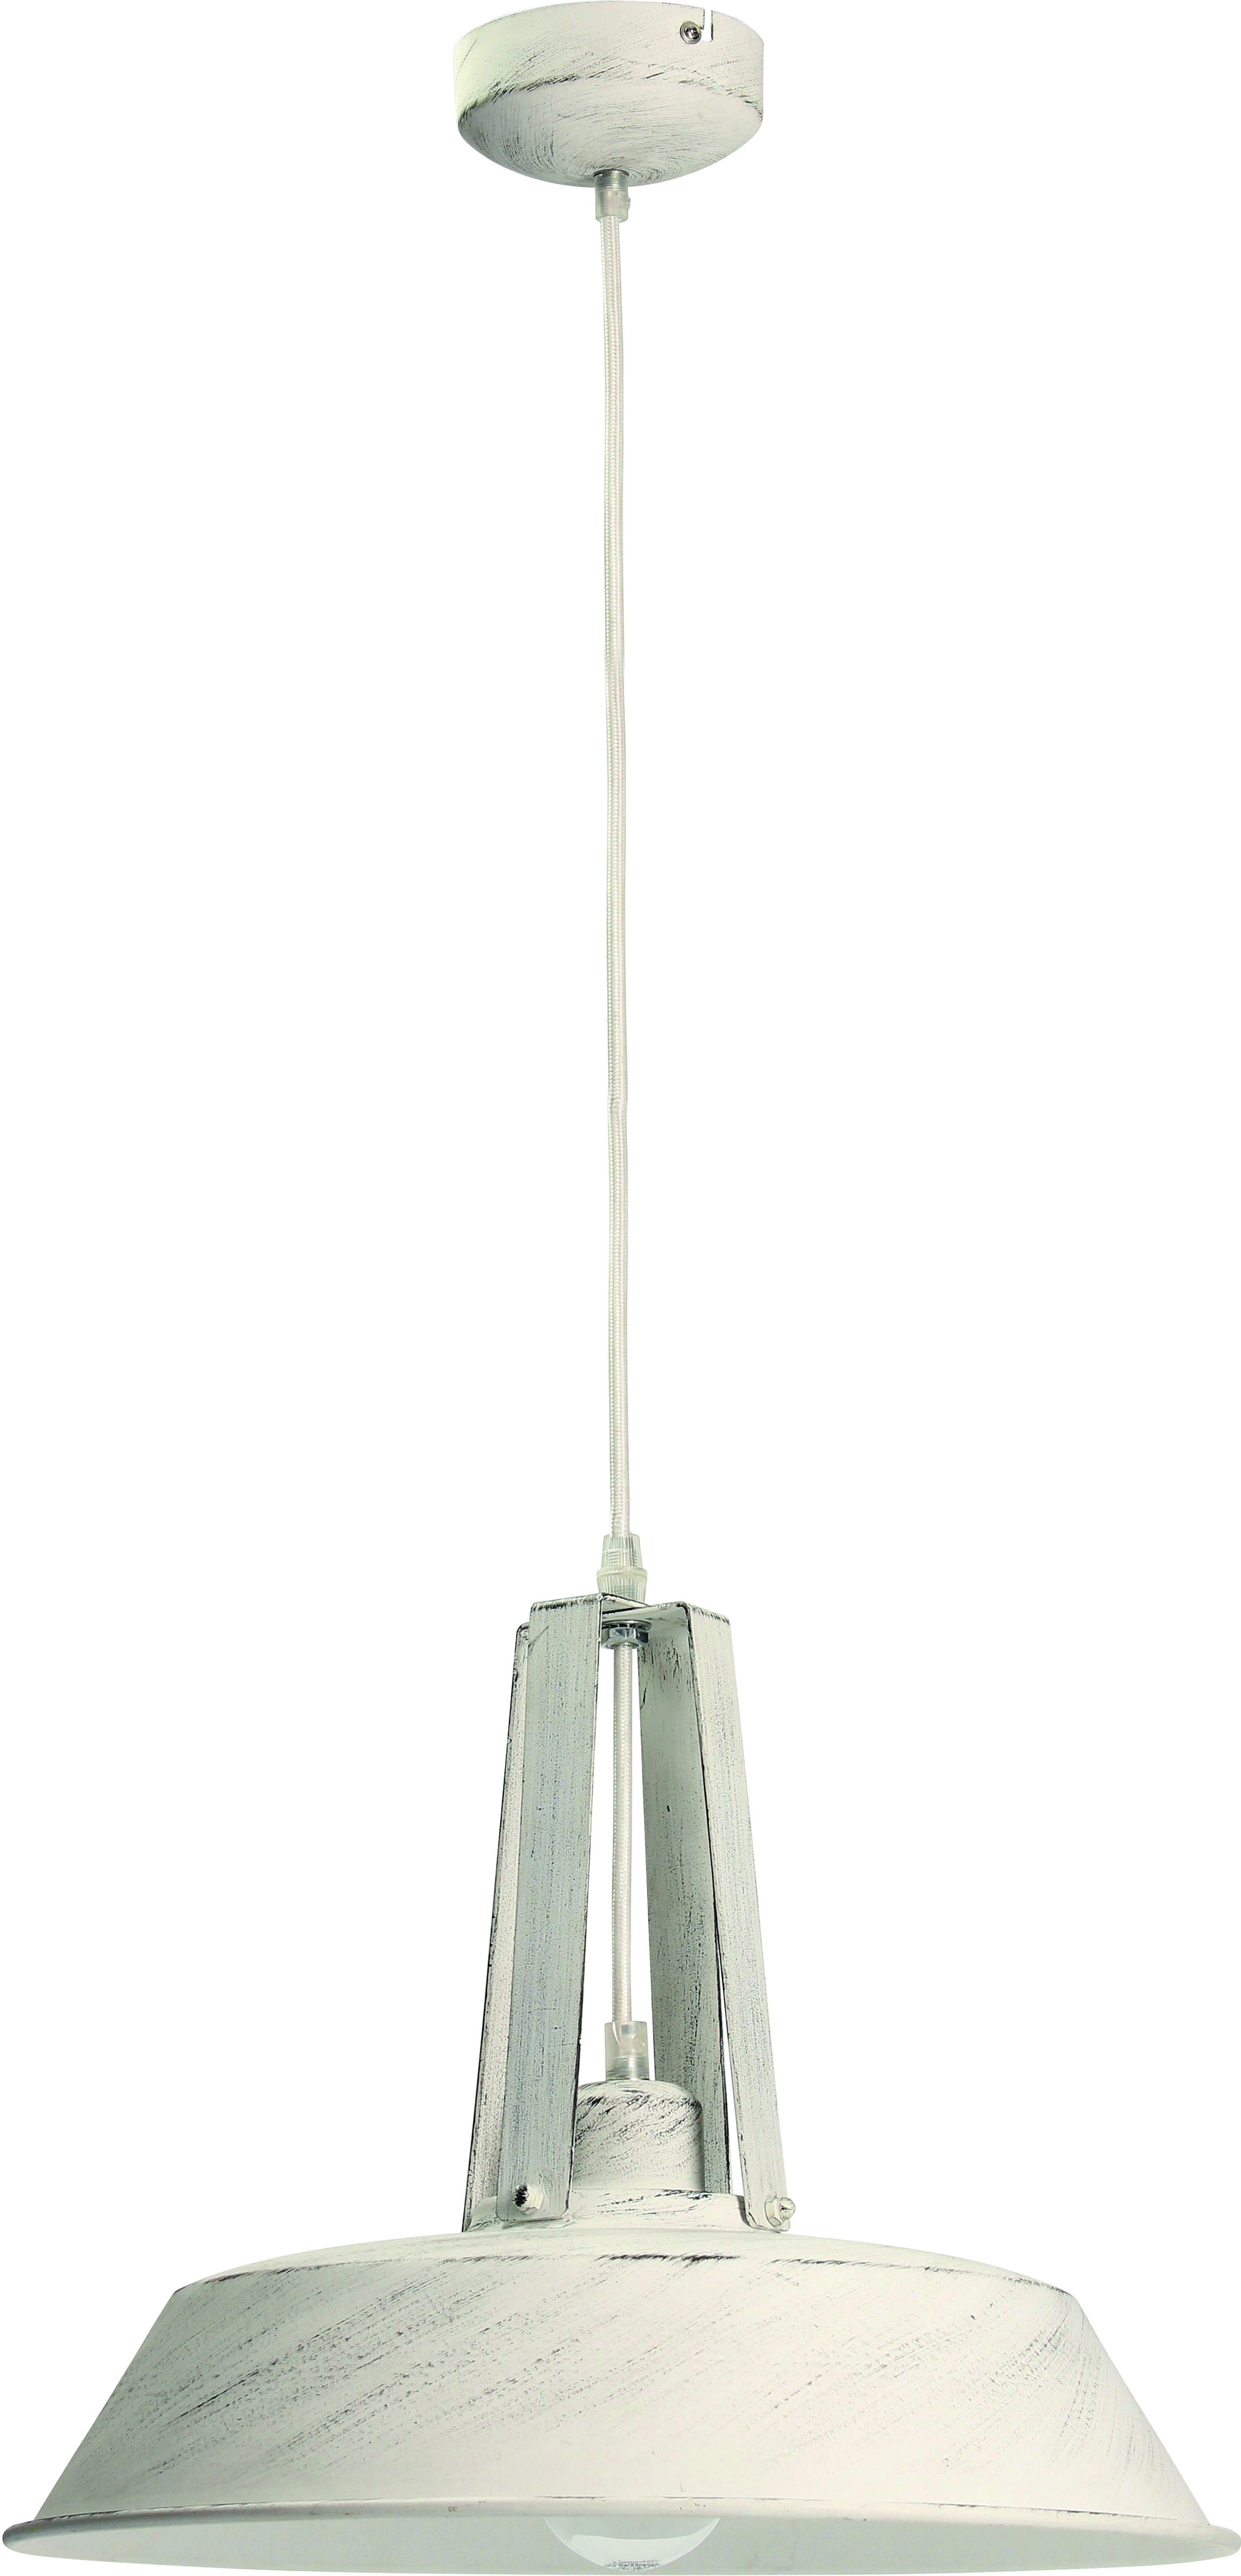 Hanging lamp with metal Alvar white antique